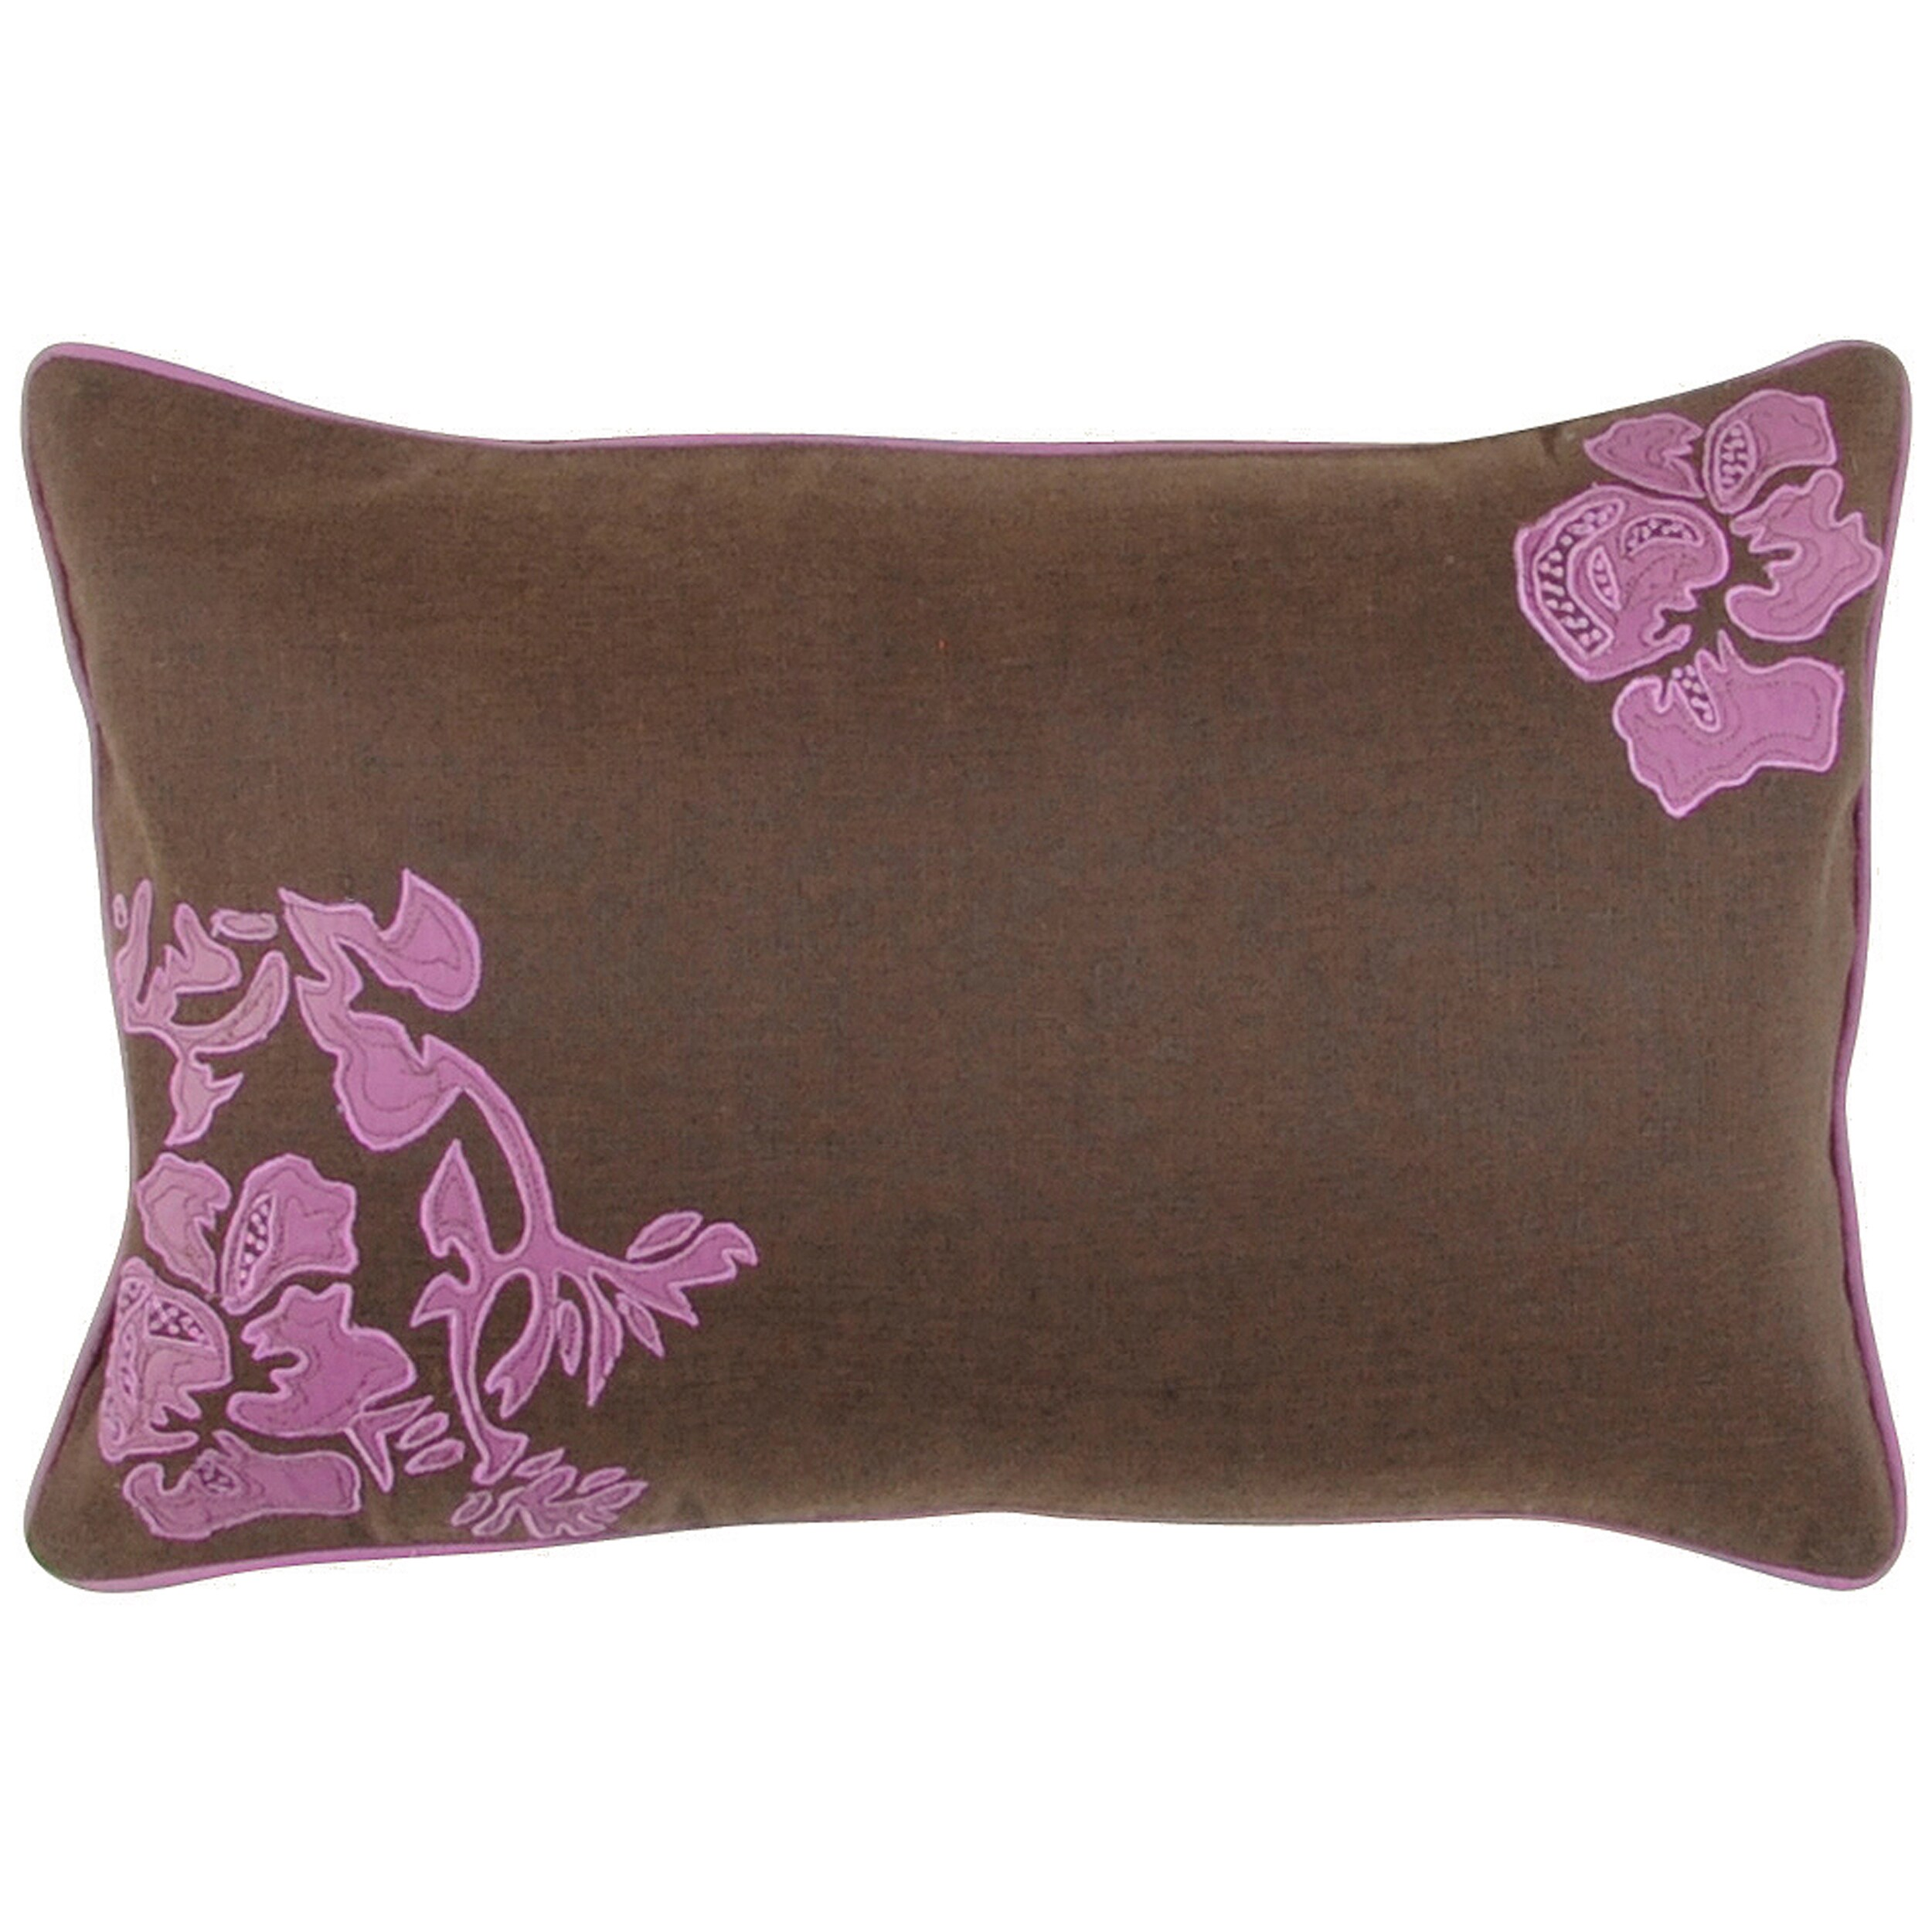 Decorative Liverpool Pillow